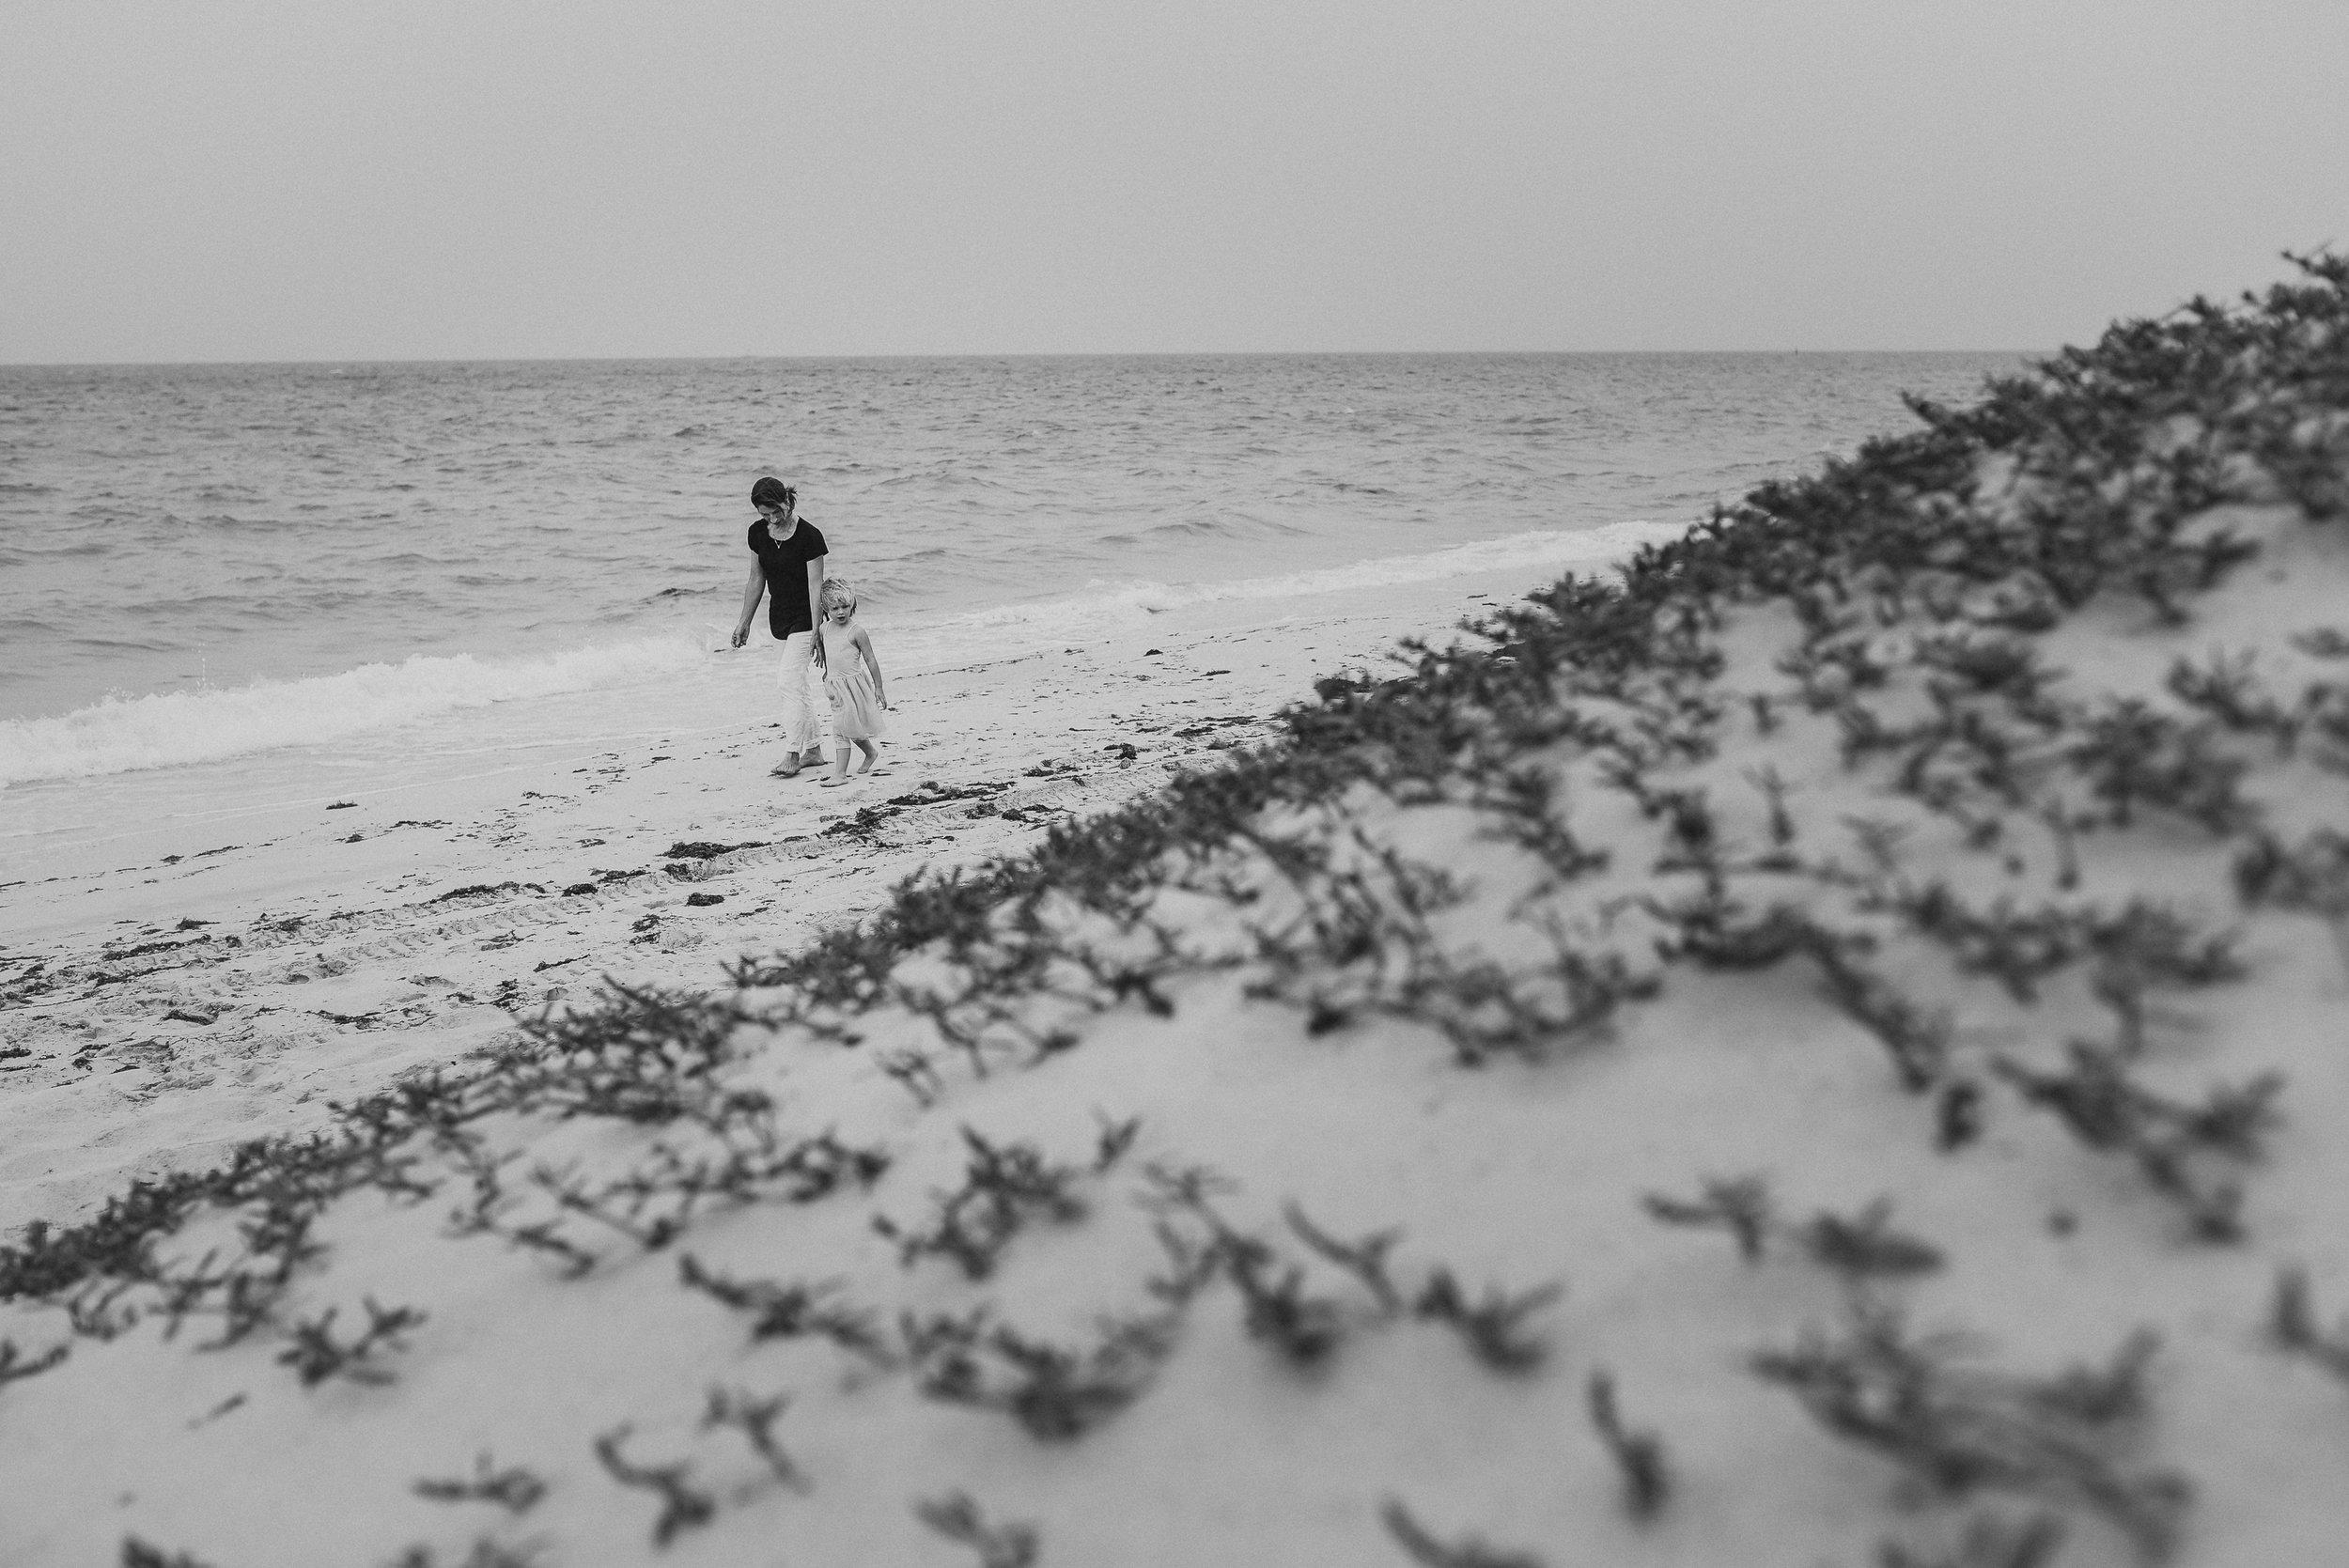 saudi arabia family photographer, dubai family photographer, bahrain family photographer, dslrfilmmaking, documentary photography, lifestyle family photography, lifestyle family photographer saudi arabia